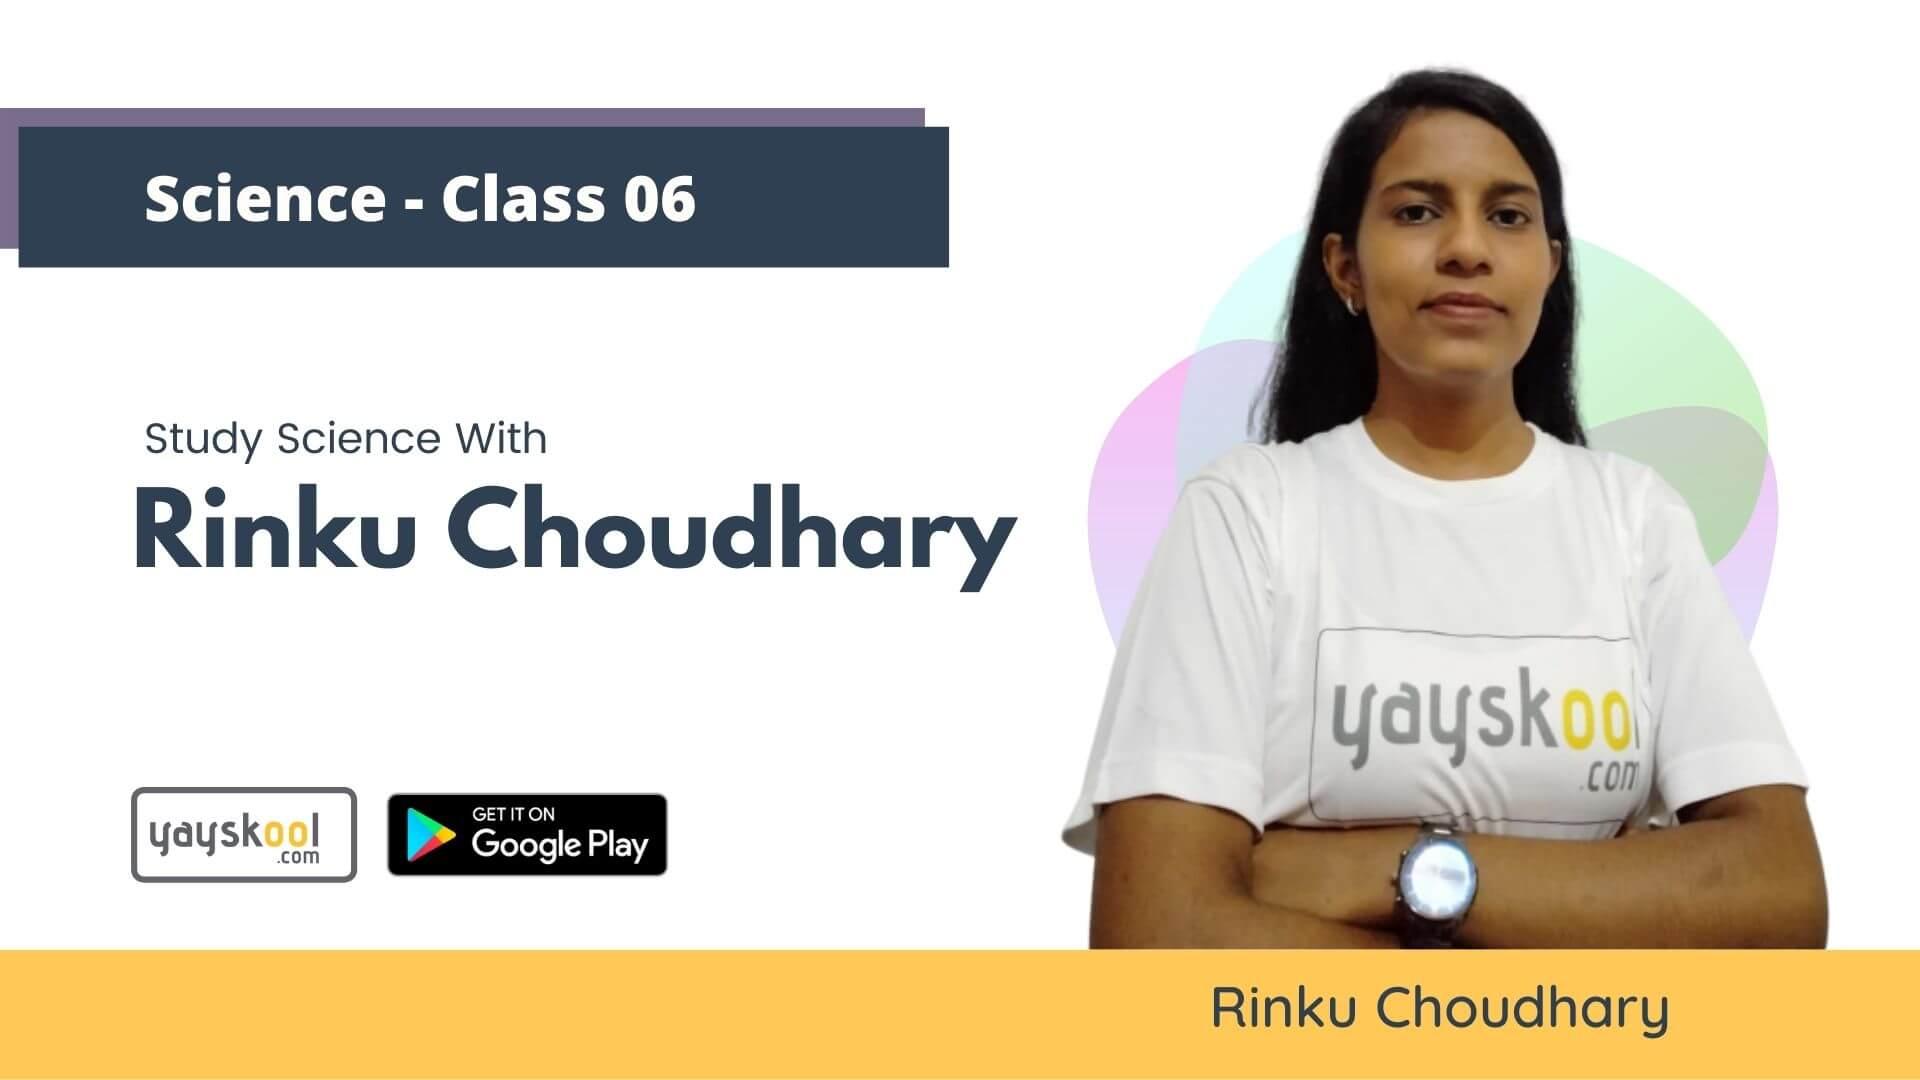 science-course-class06-rinku-choudhary